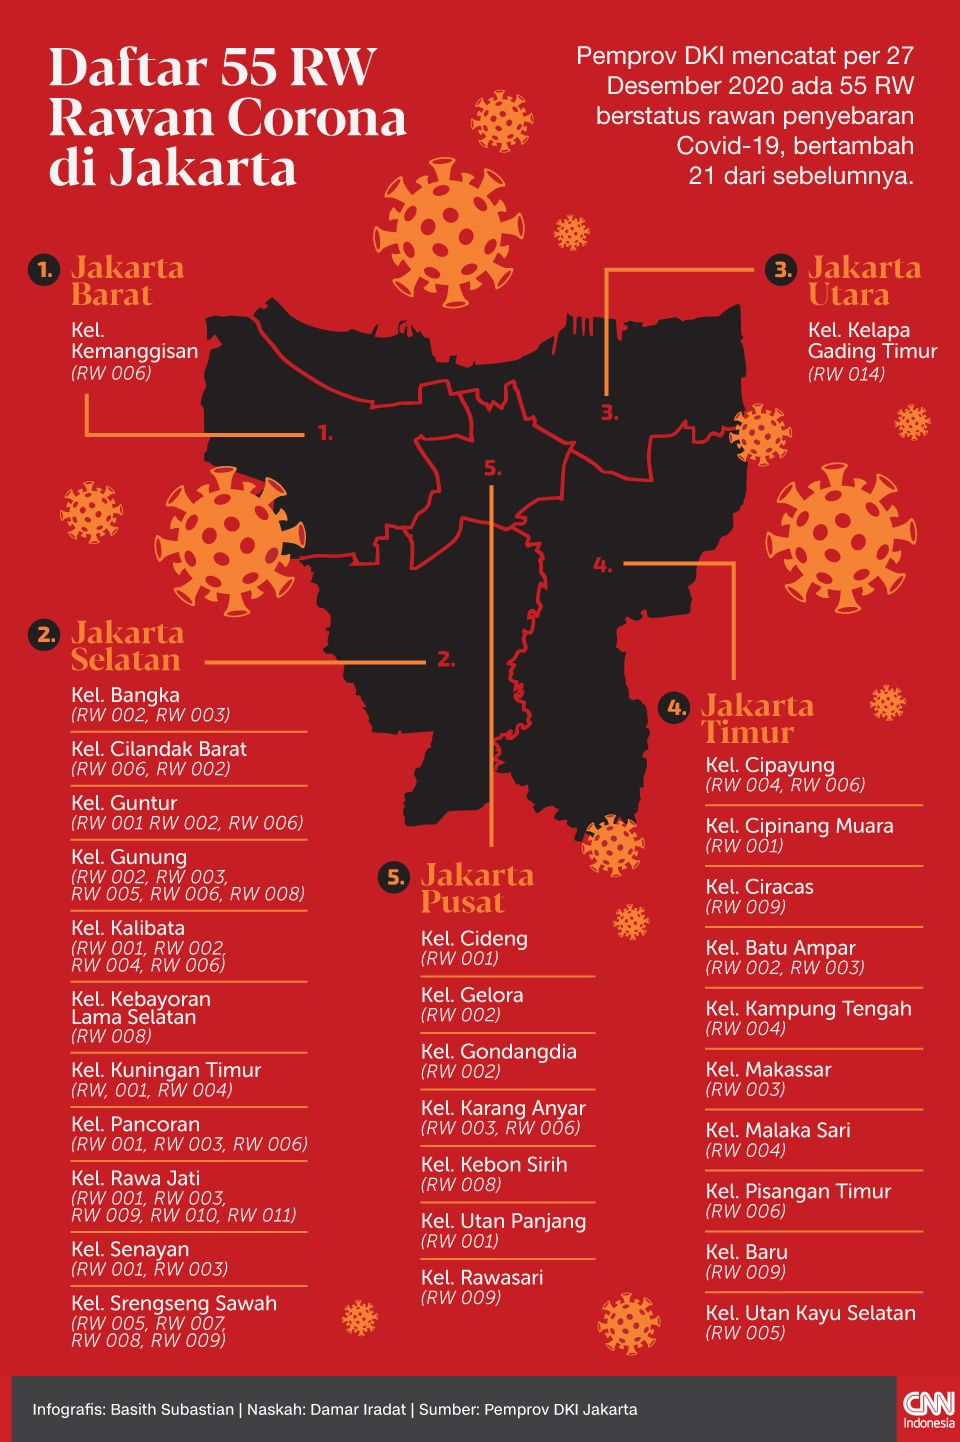 Infografis Daftar 55 RW Rawan Corona di Jakarta